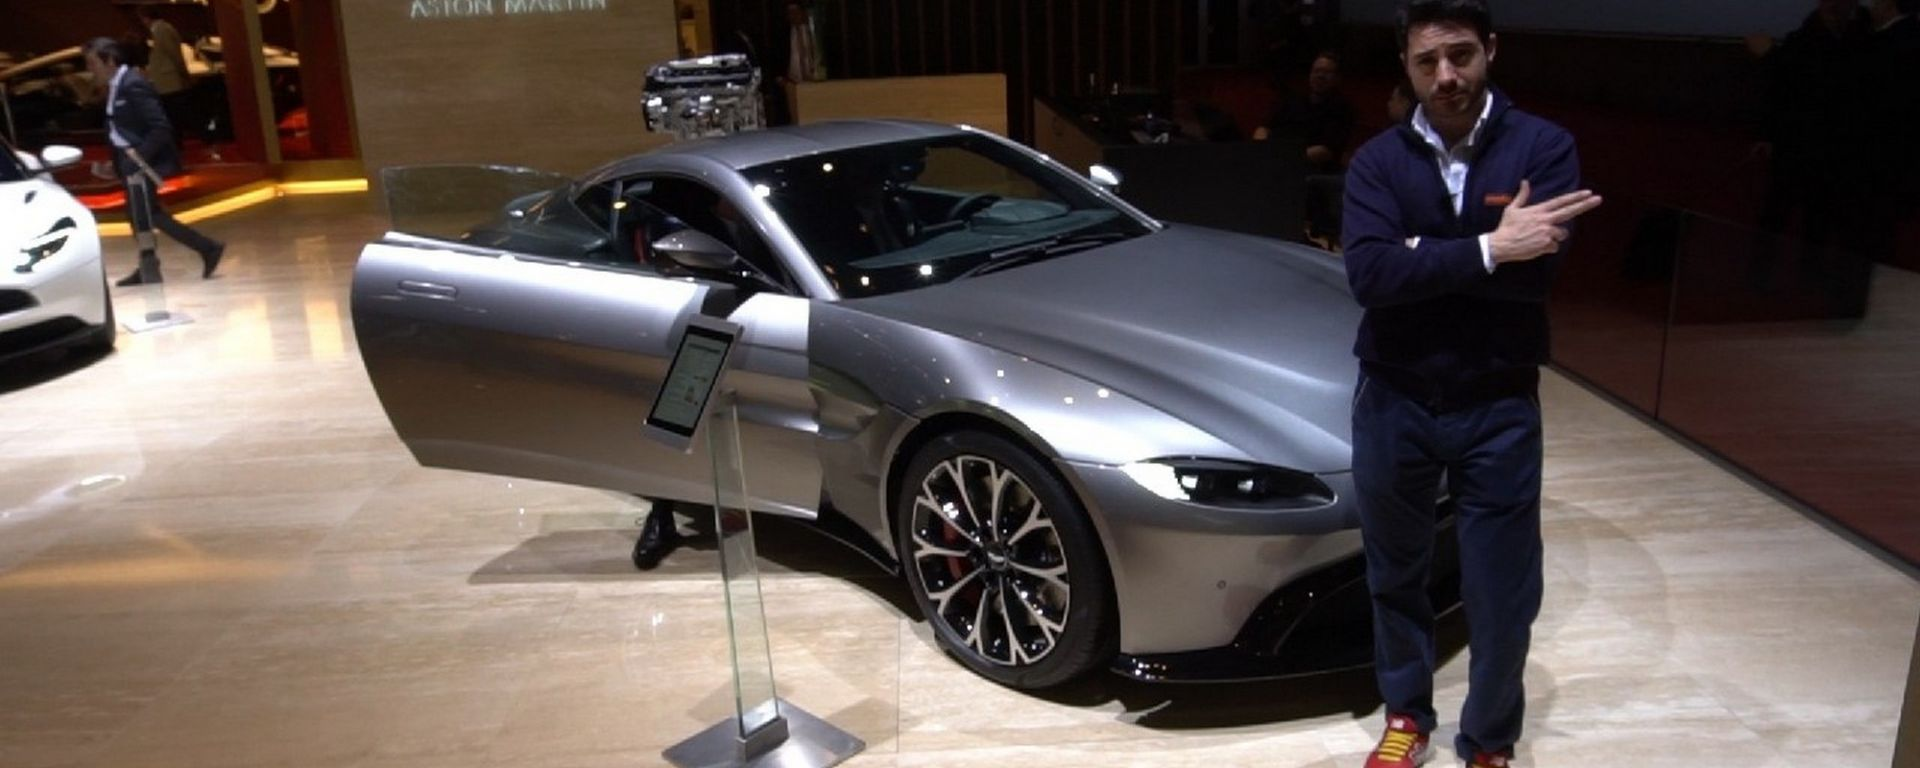 Aston Martin V8 Vantage a Ginevra 2018